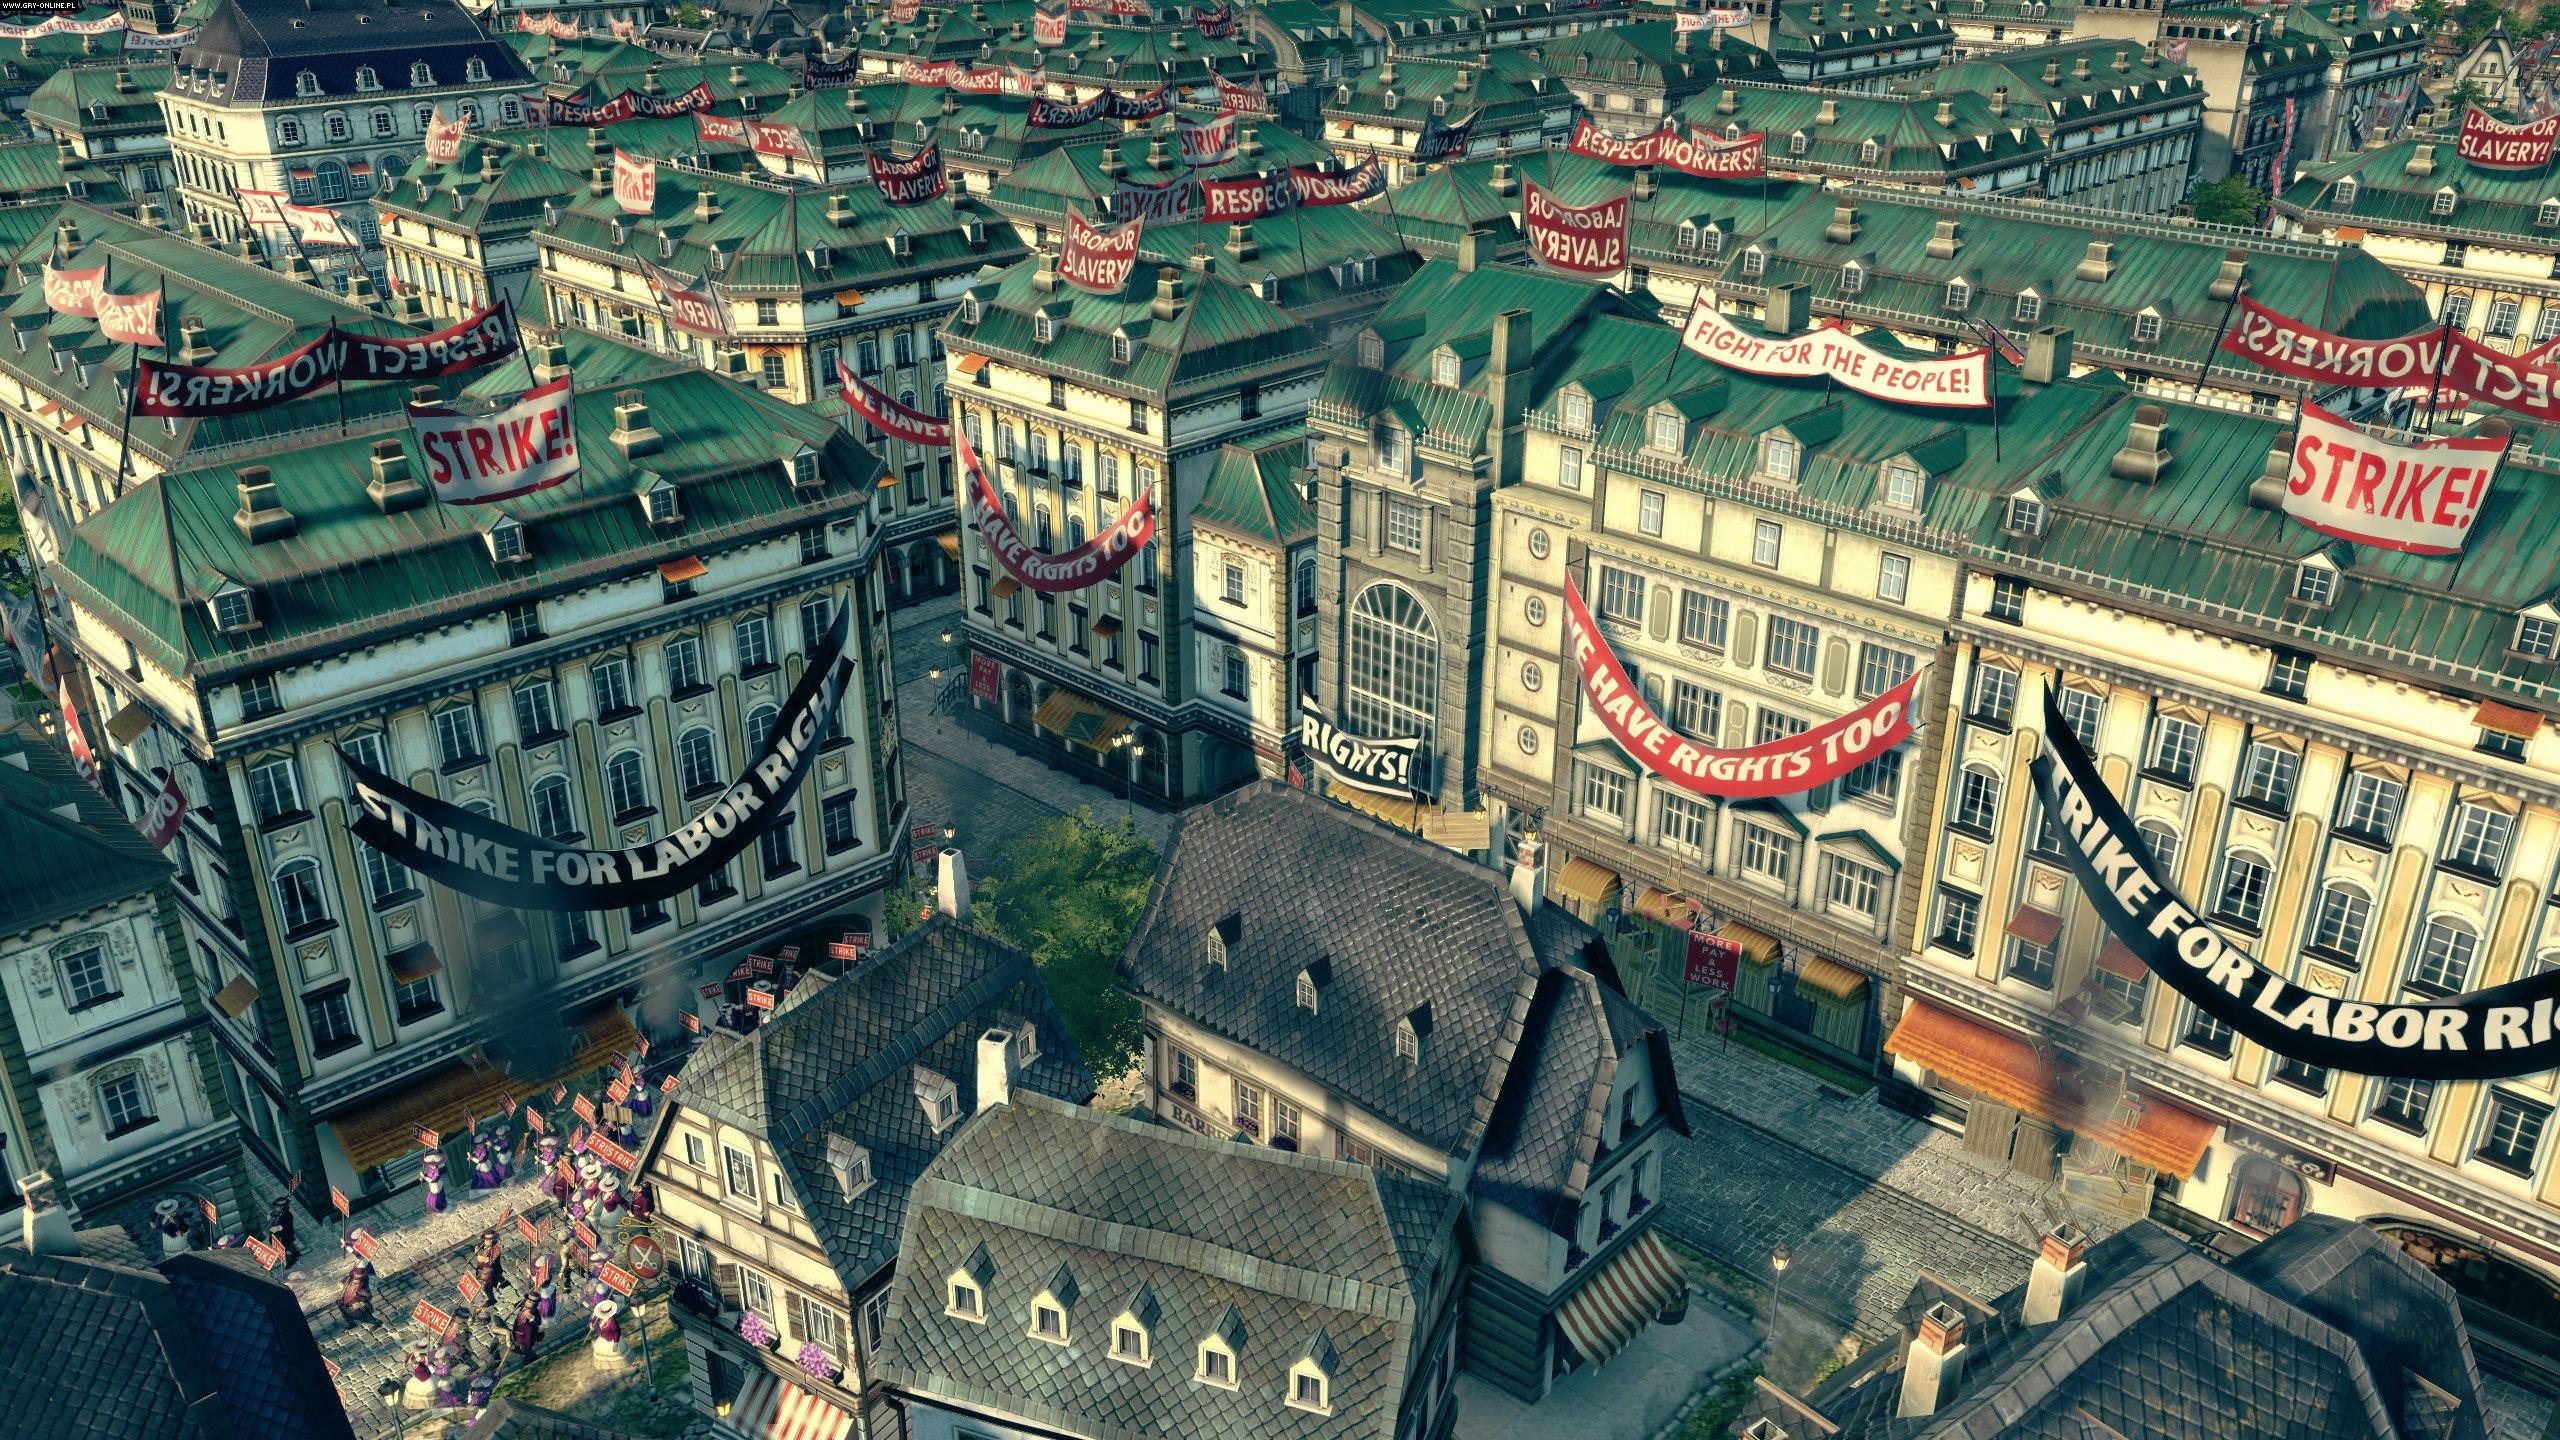 anno 1800 city background wallpaper 67416